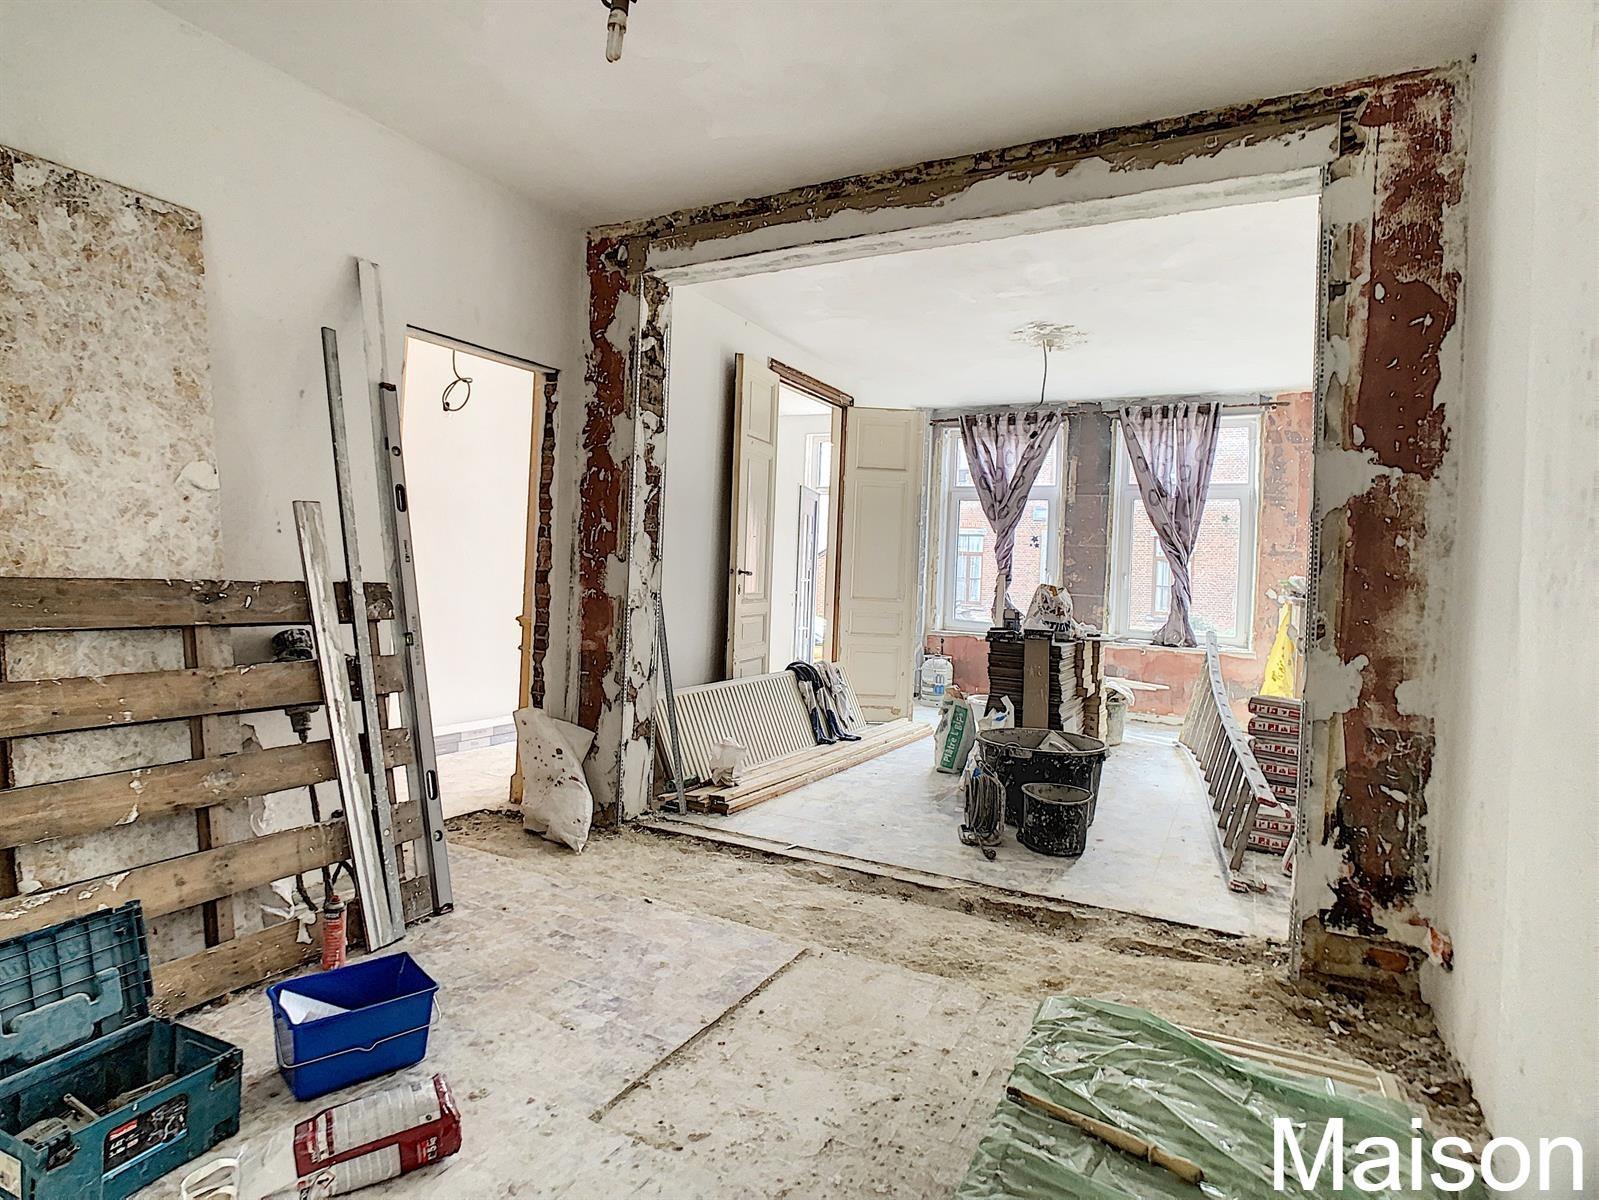 Maison - Villersla-Ville Marbais - #4407538-6